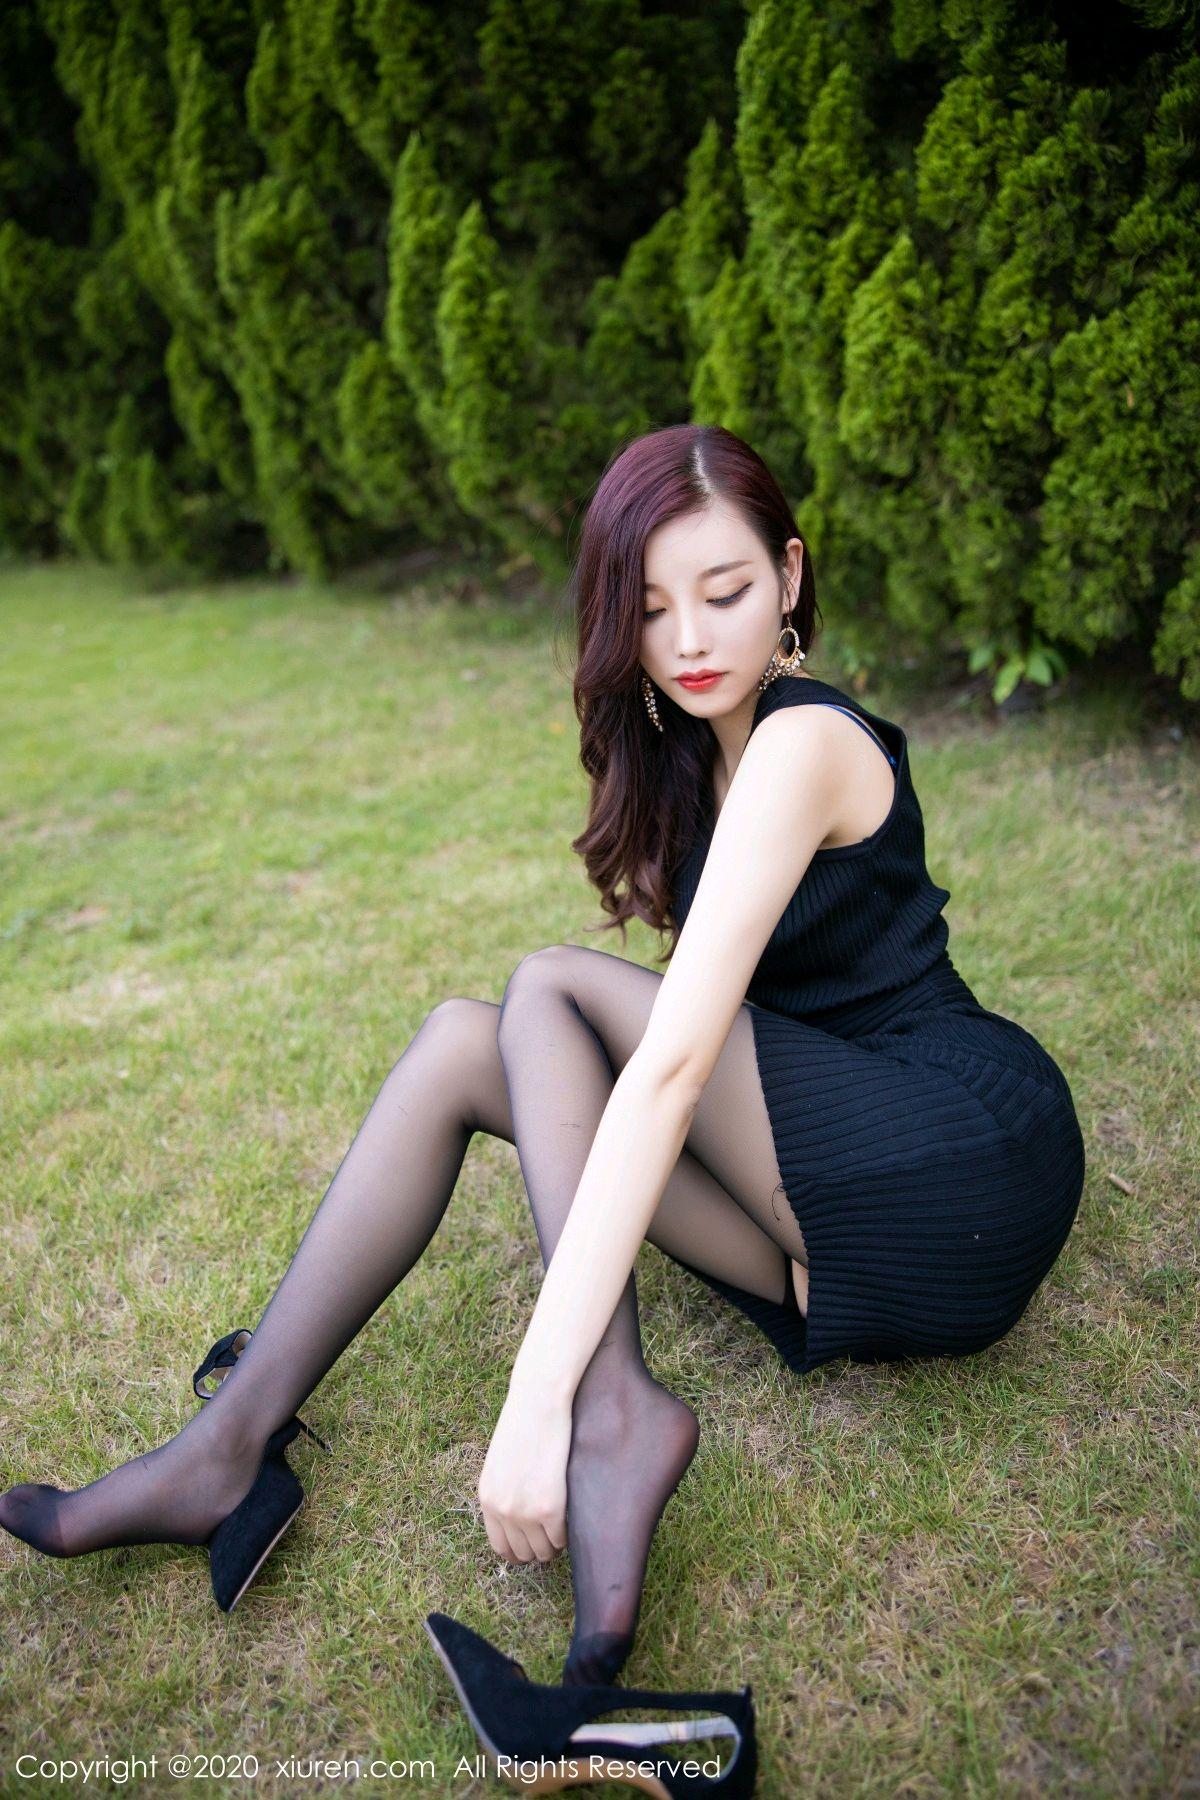 [XiuRen] Vol.2648 Yang Chen Chen 22P, Black Silk, Outdoor, Xiuren, Yang Chen Chen